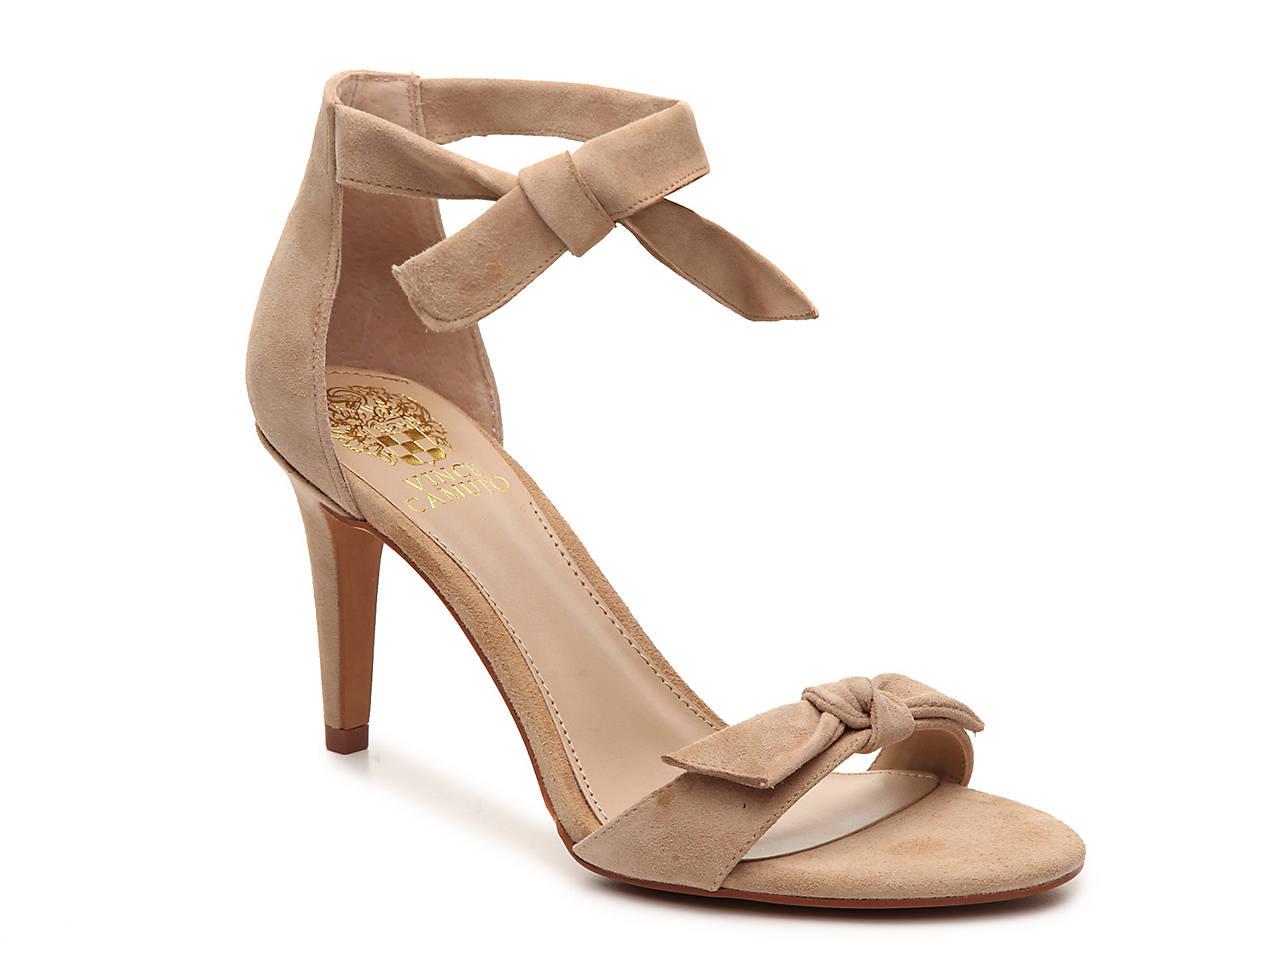 941b58449db0 Vince Camuto Camylla Sandal Women s Shoes